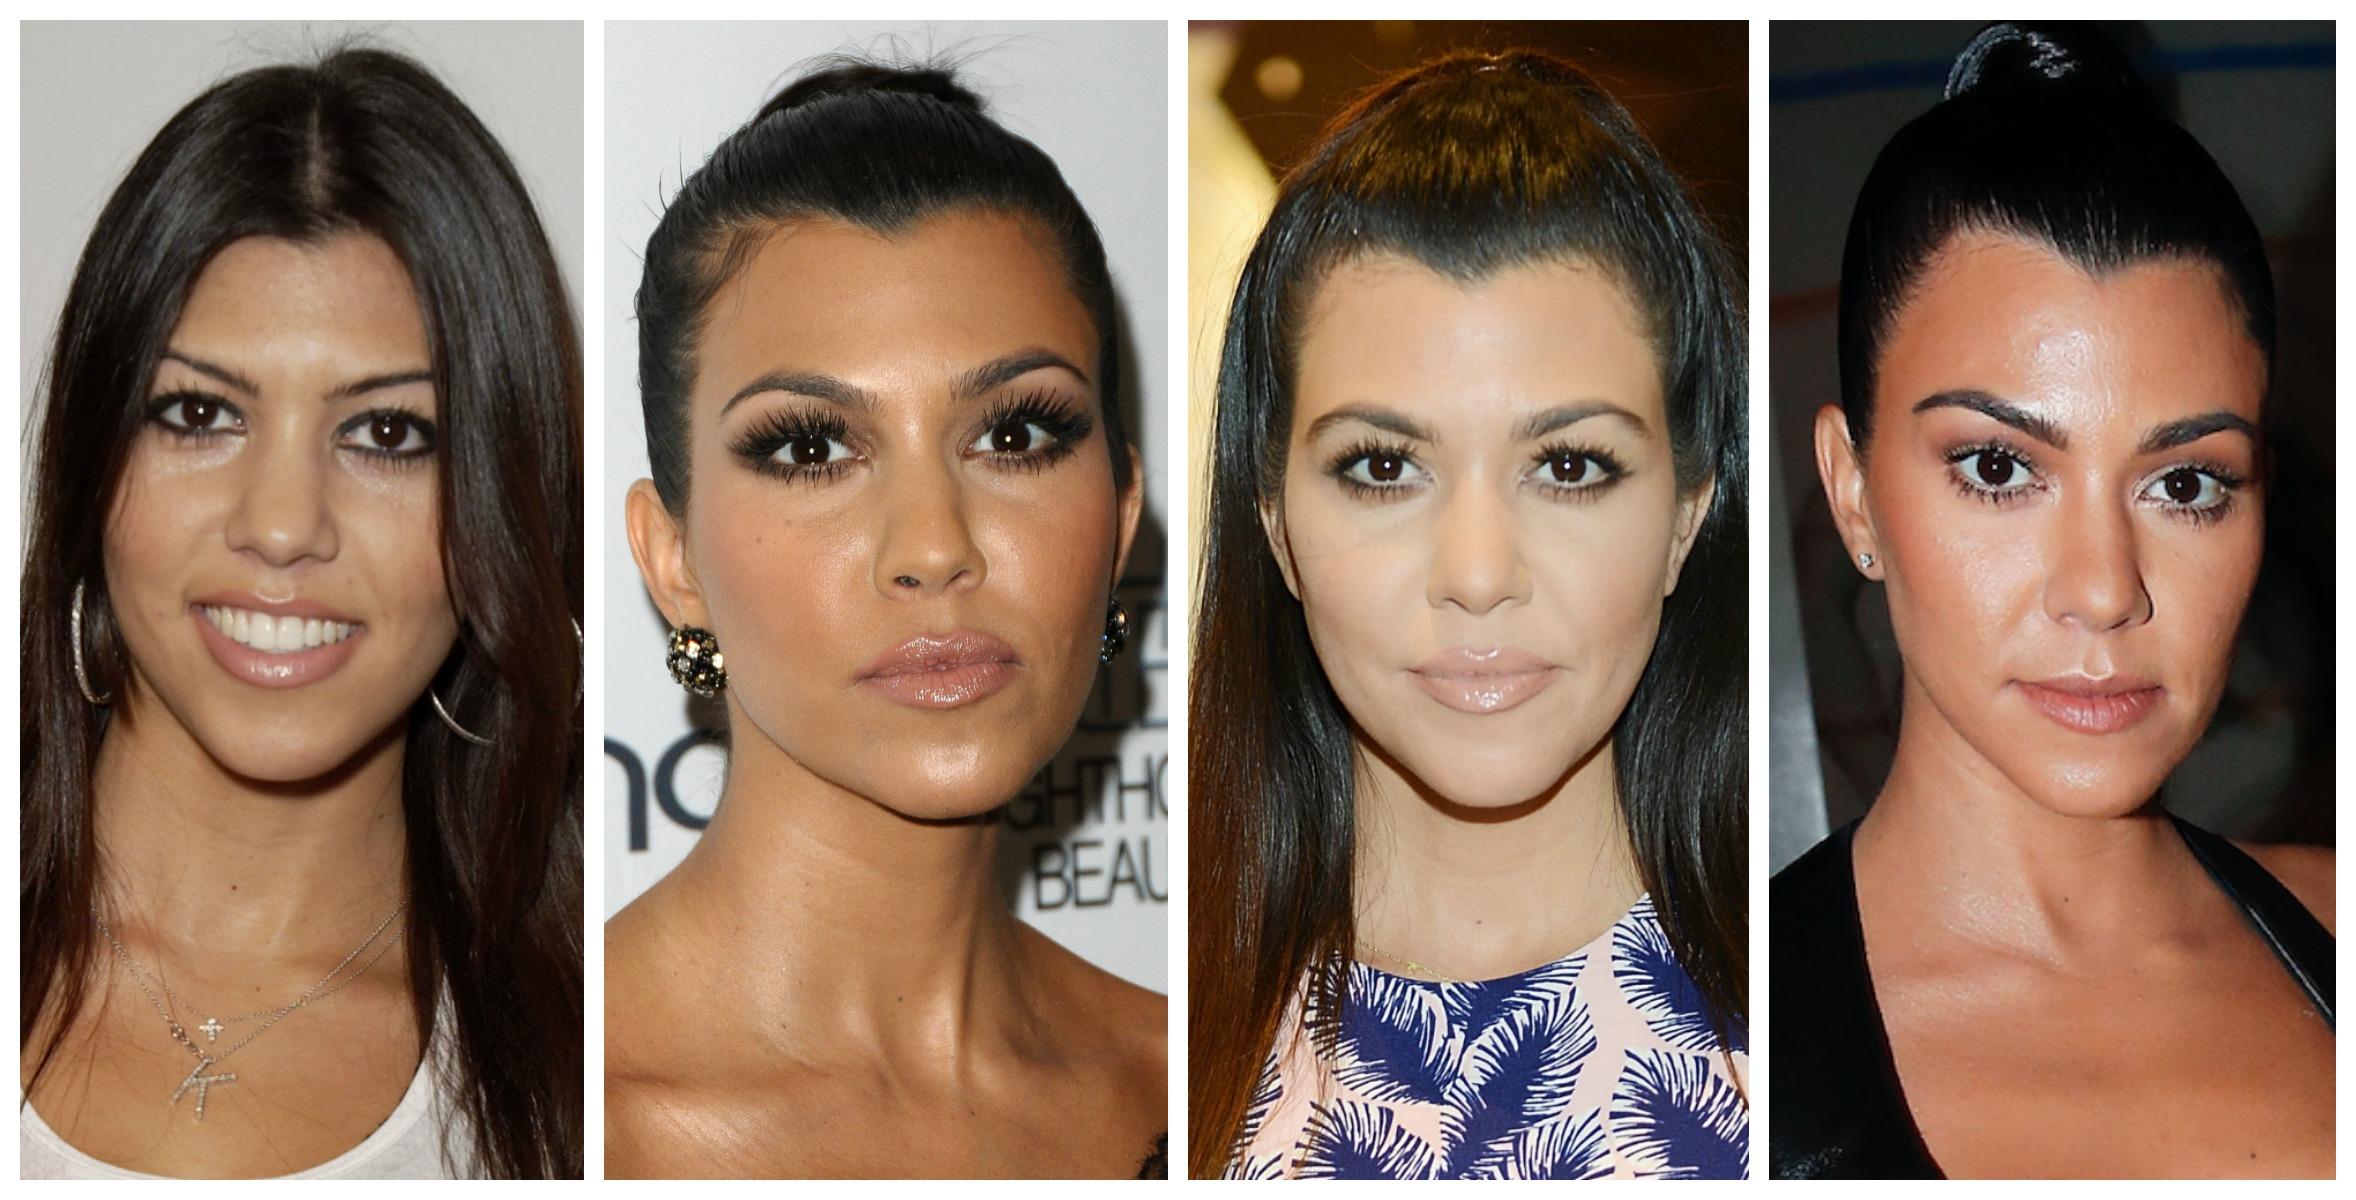 kourtney-kardashian-transformation